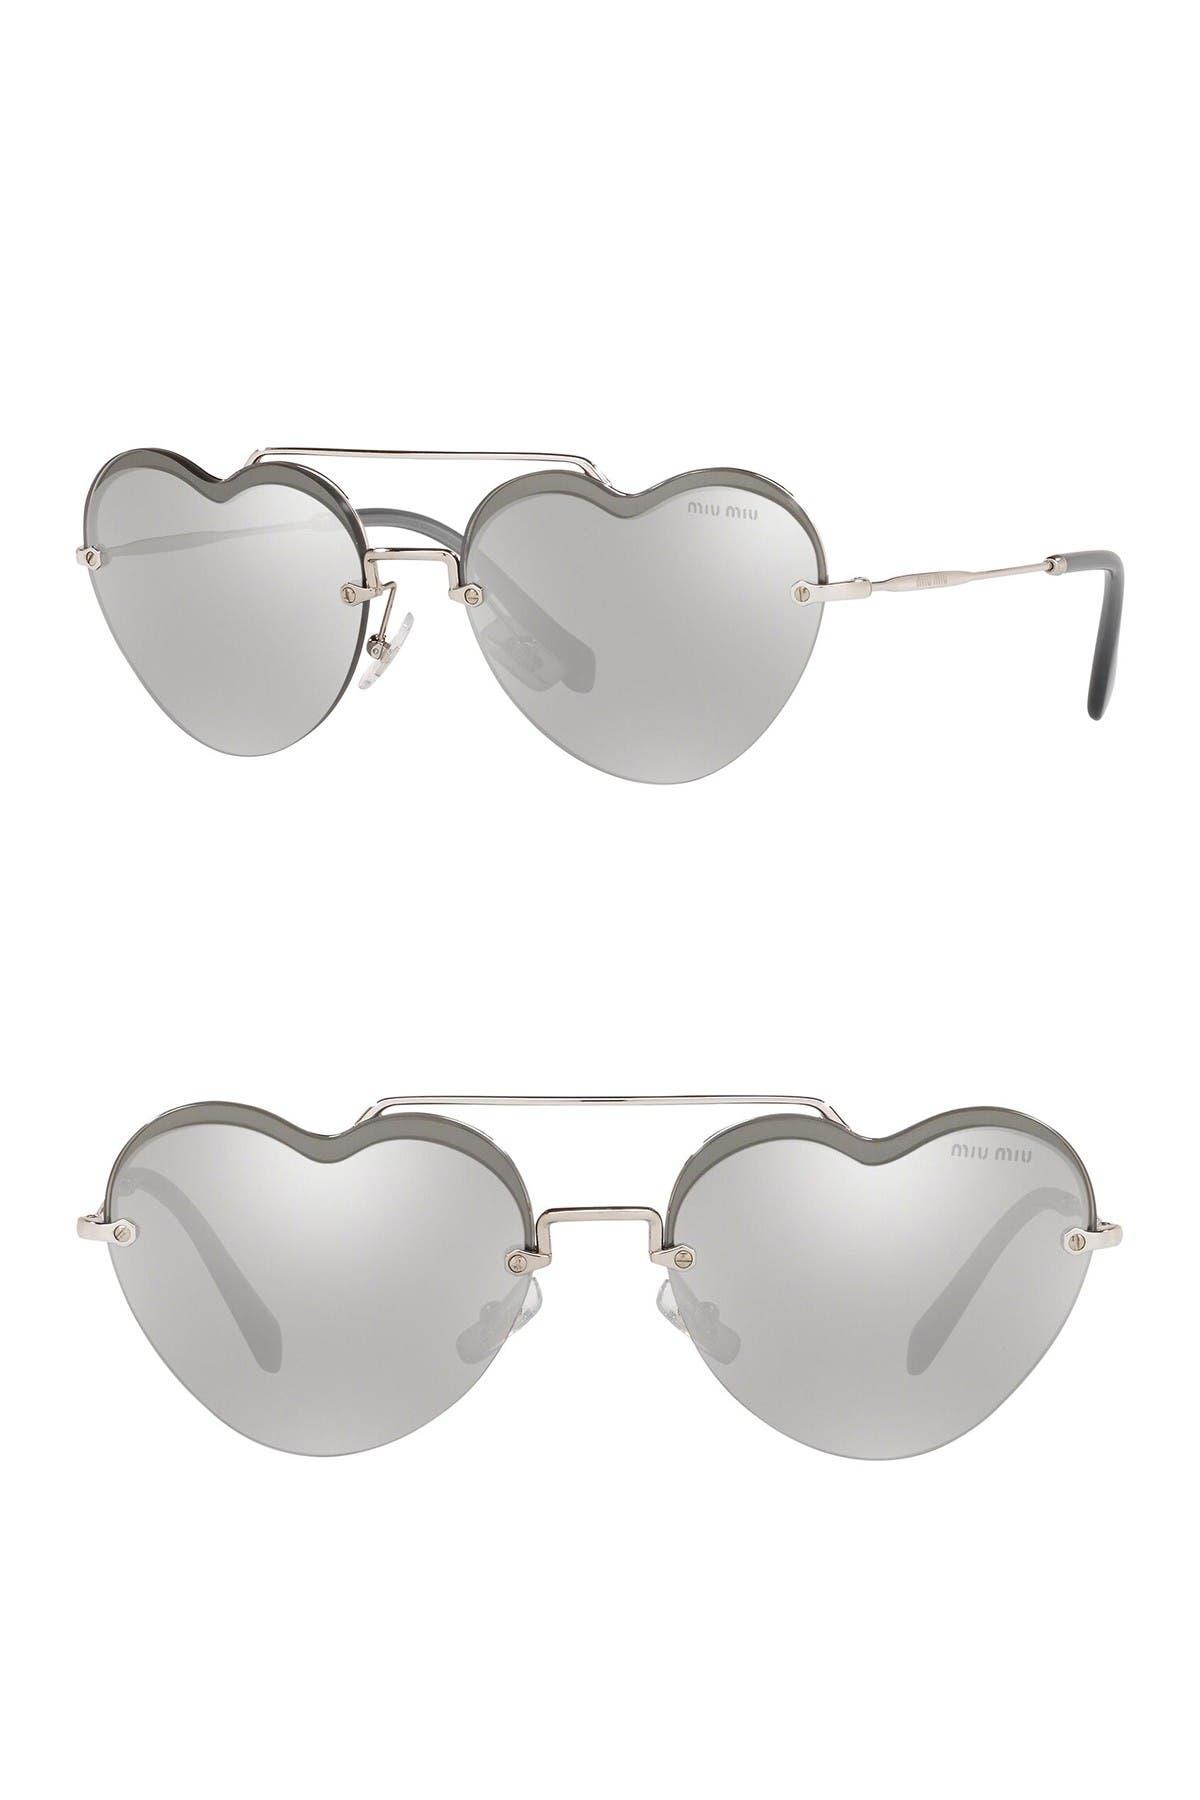 Image of MIU MIU 58mm Irregular Heart Sunglasses